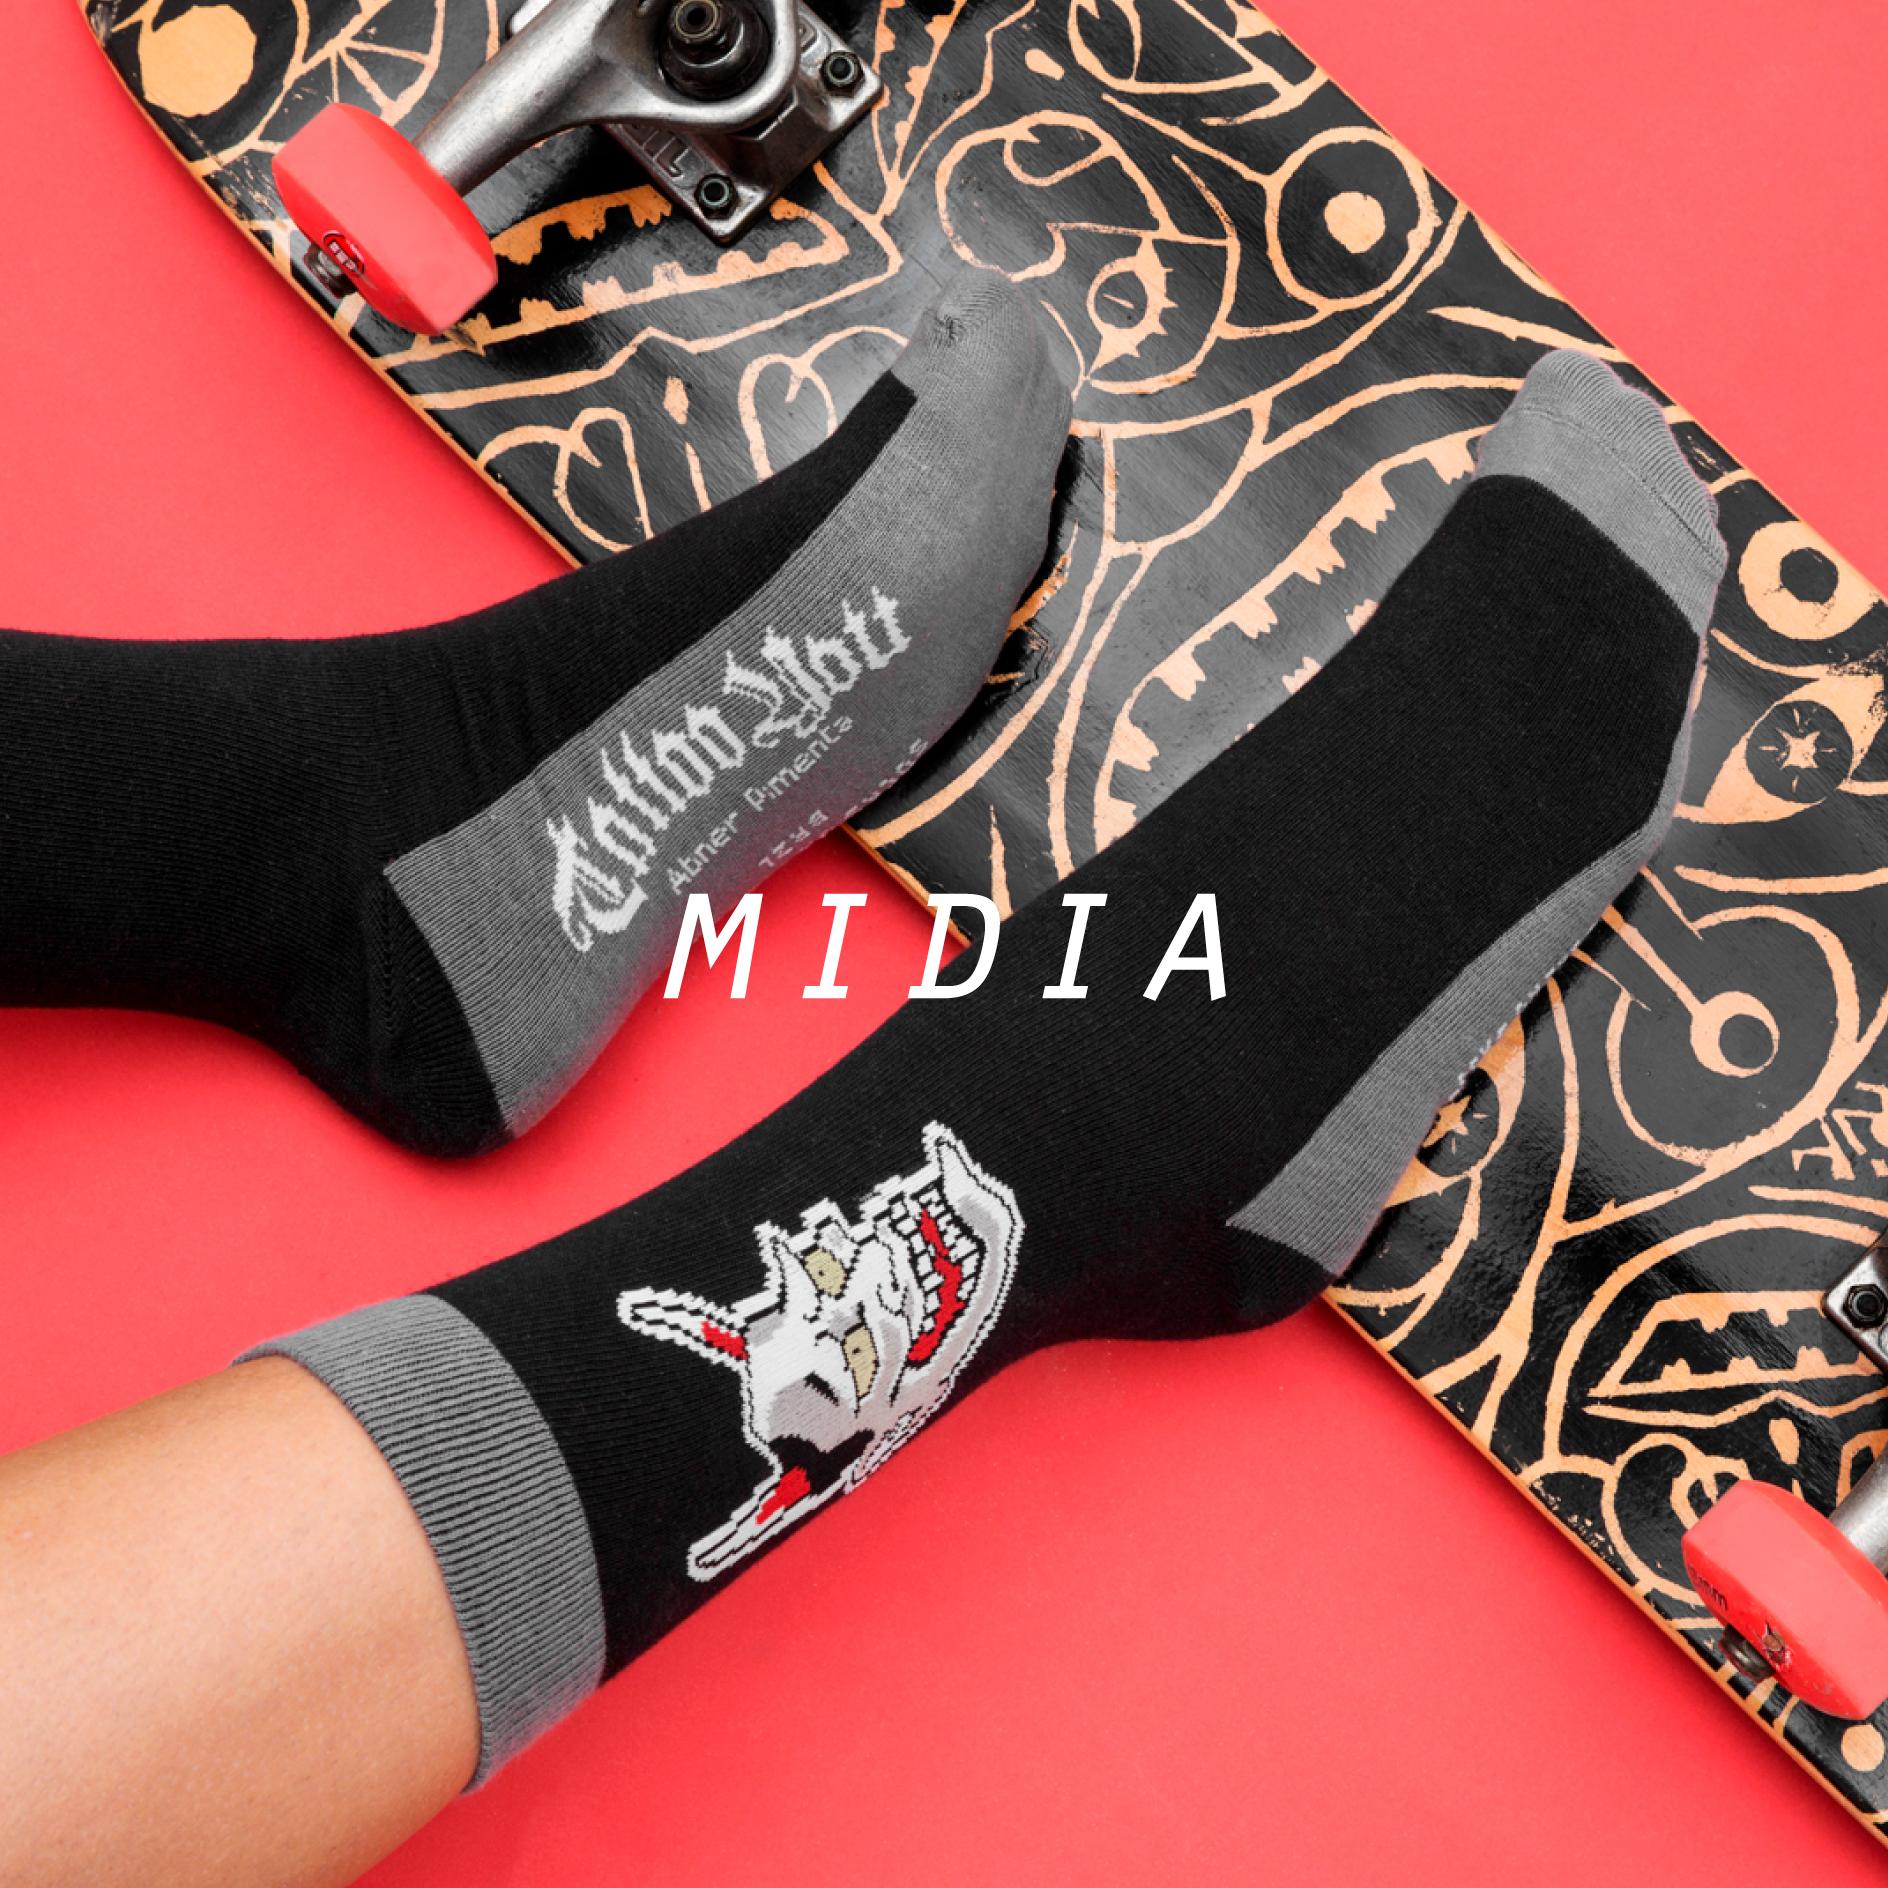 sotb_midia-socks-on-the-beat